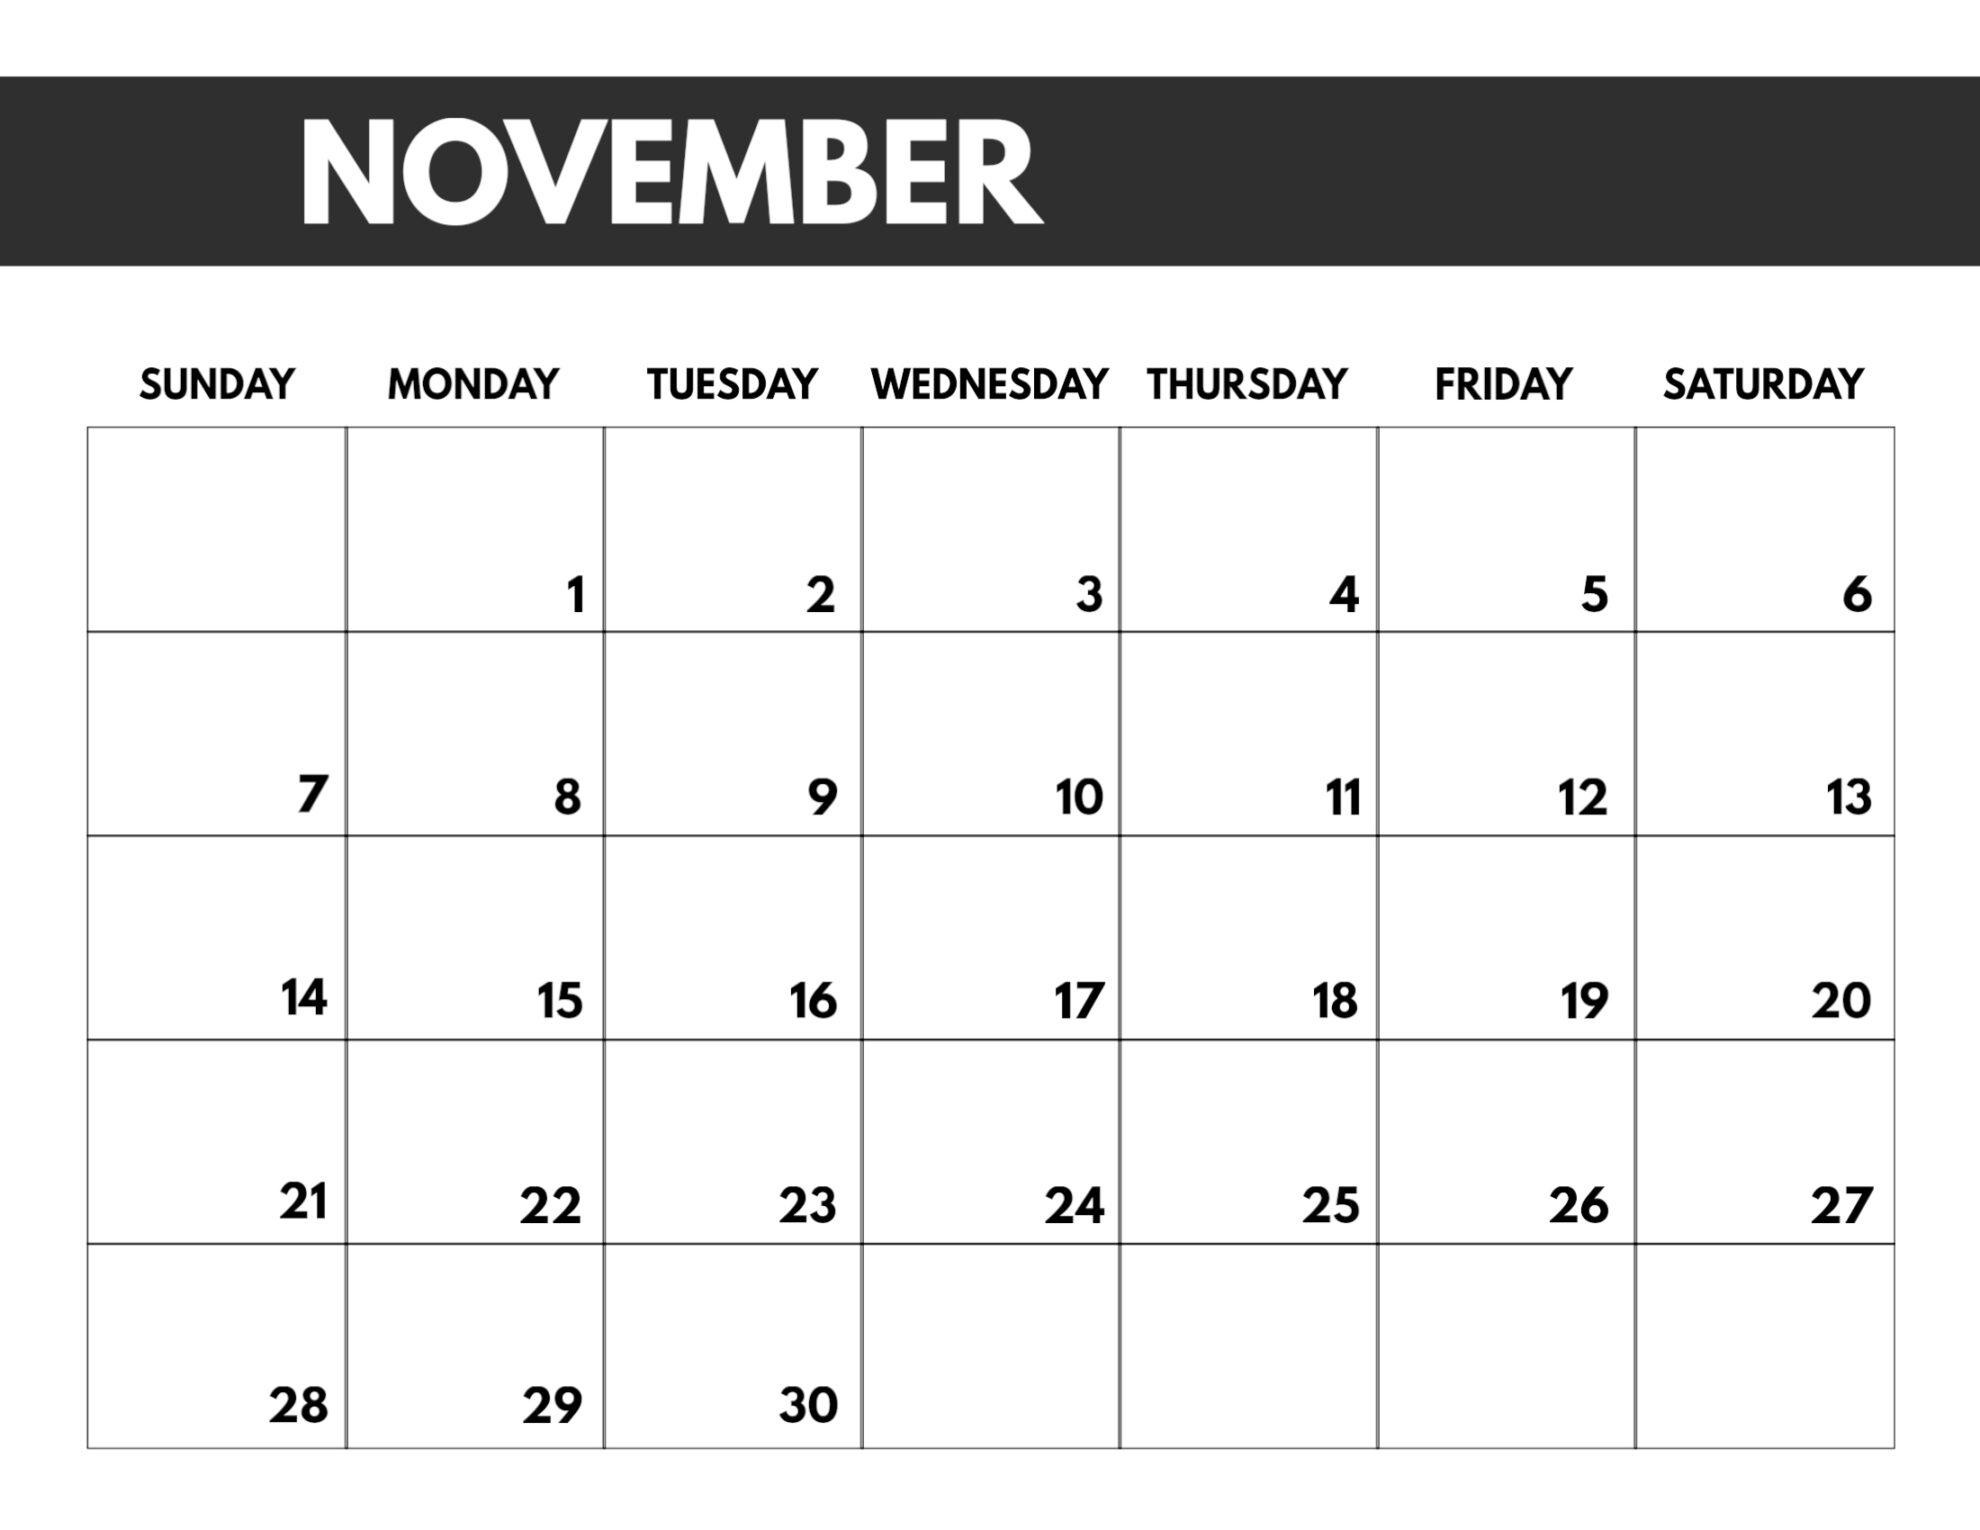 2021 Free Monthly Calendar Templates   Paper Trail Design in Calendar 2021 November Fill In